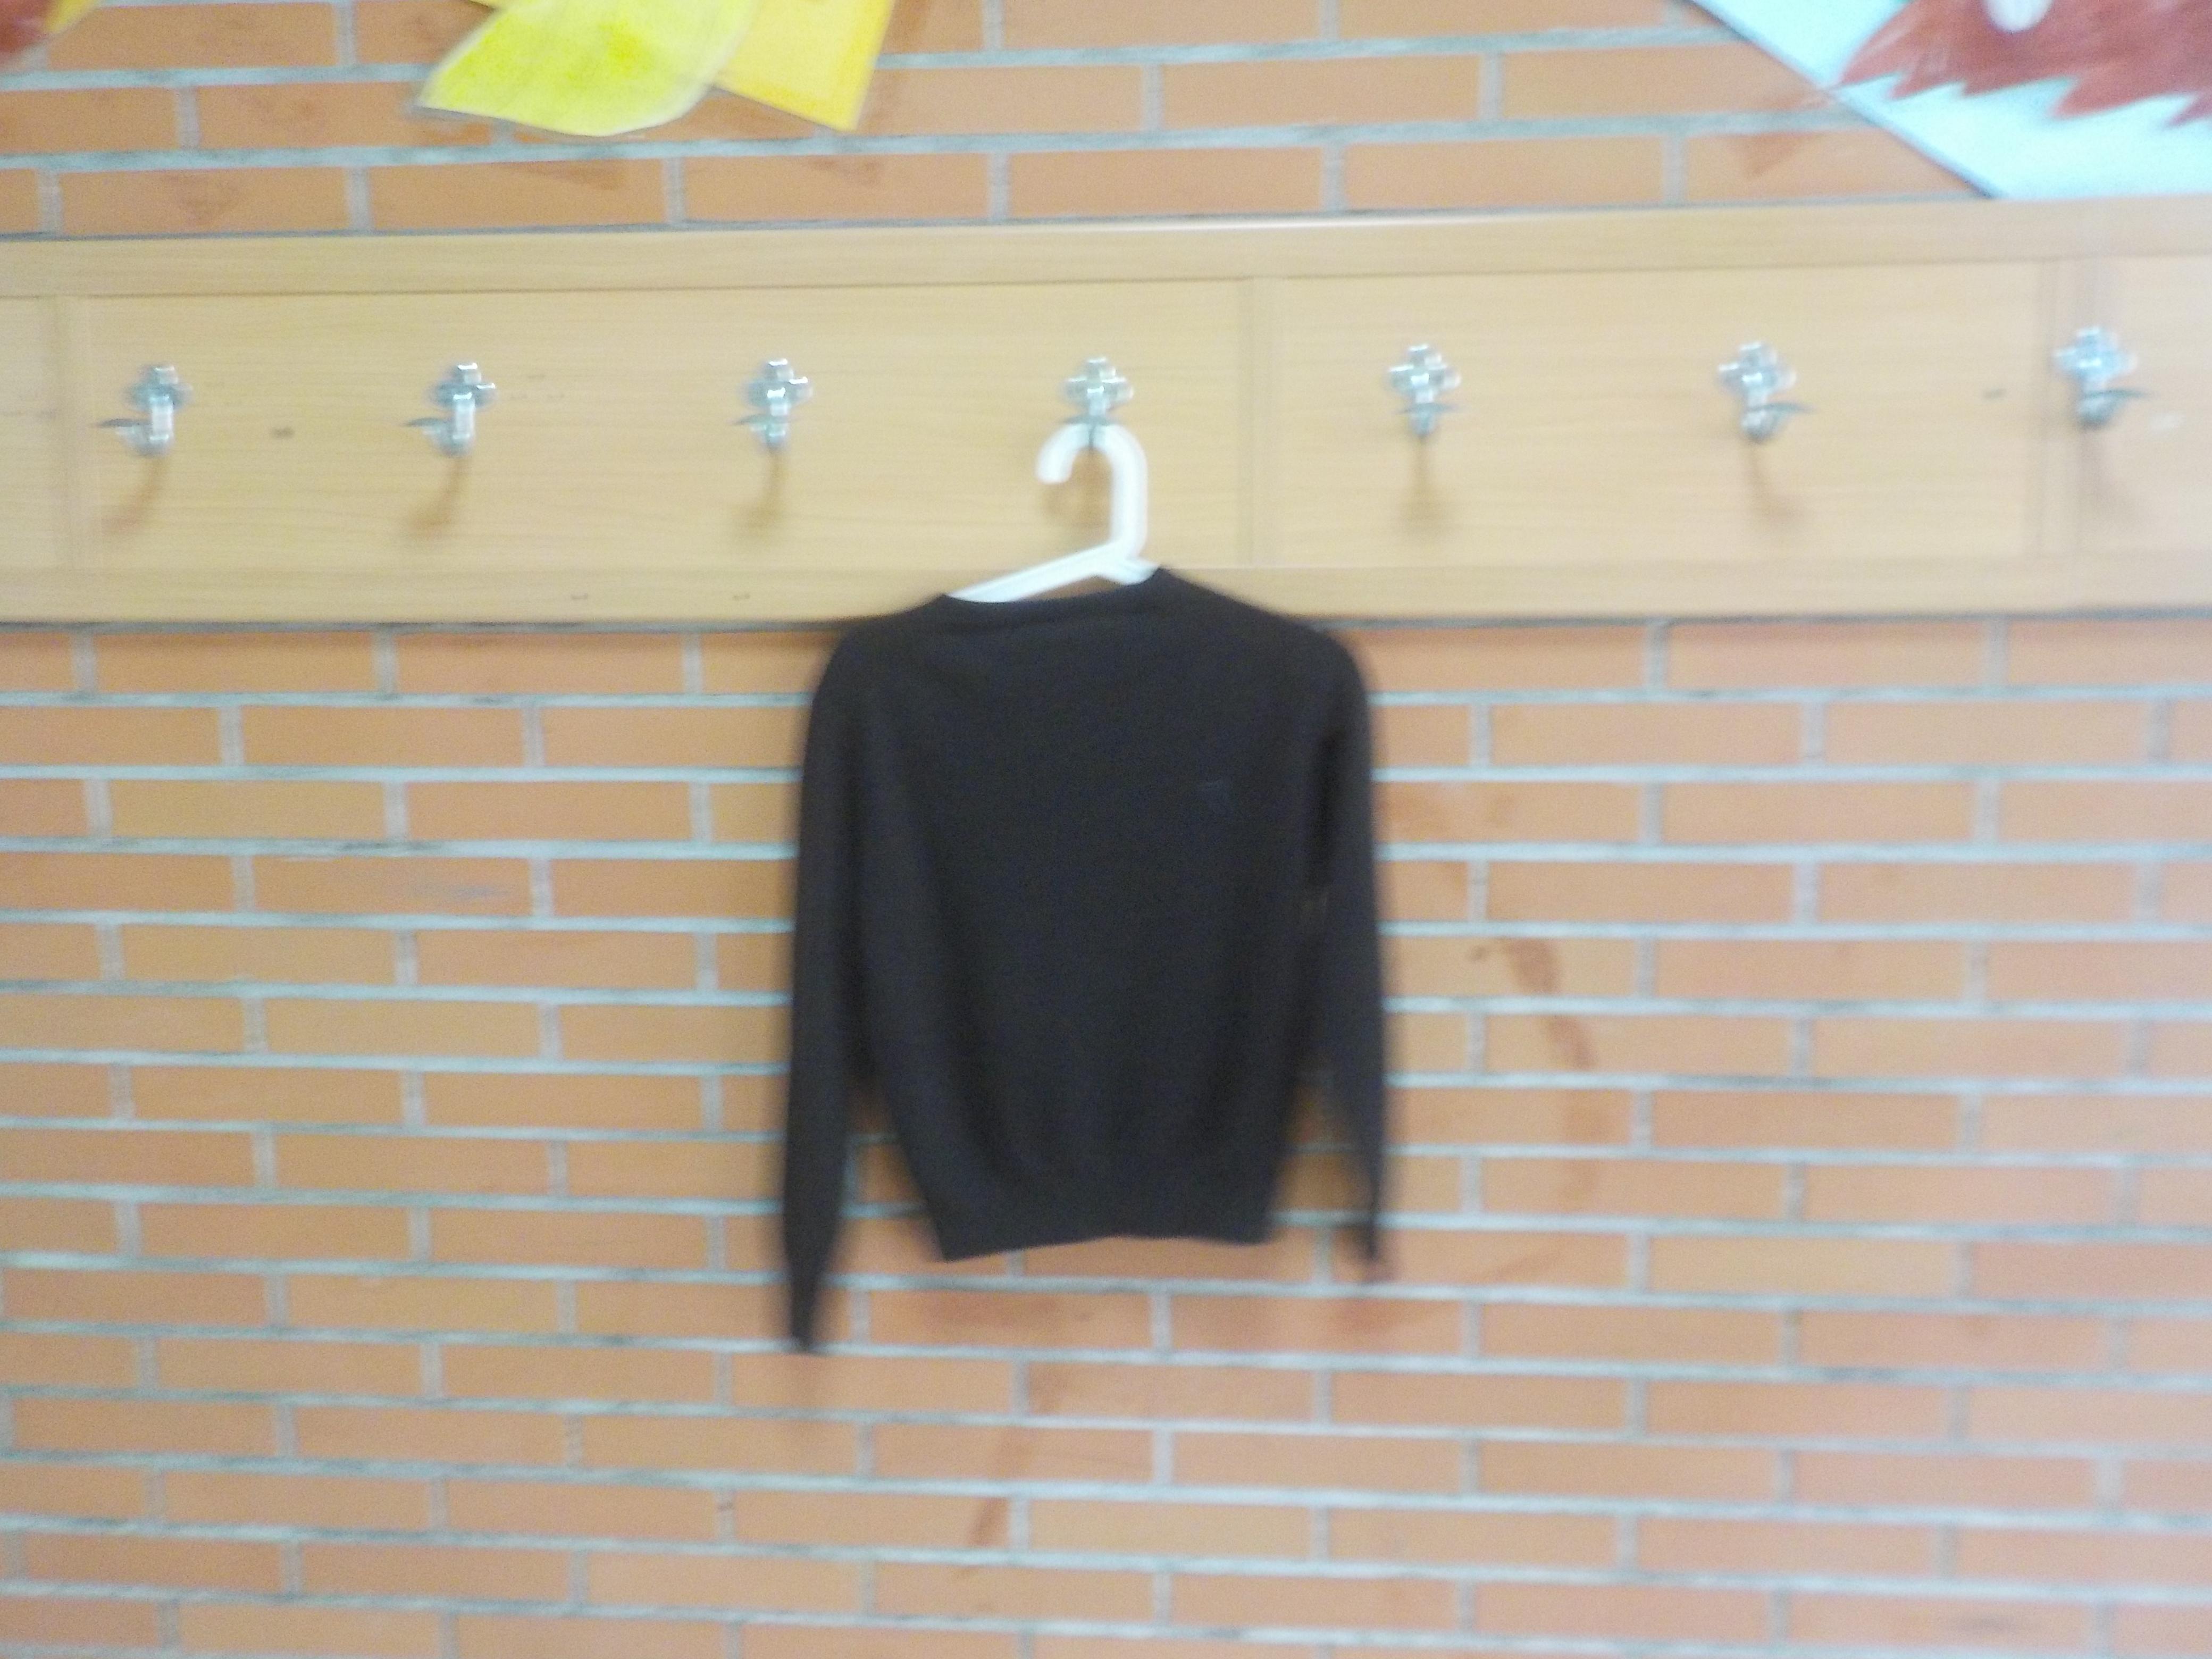 Catalogo de ropa olvidada 1  2018 12